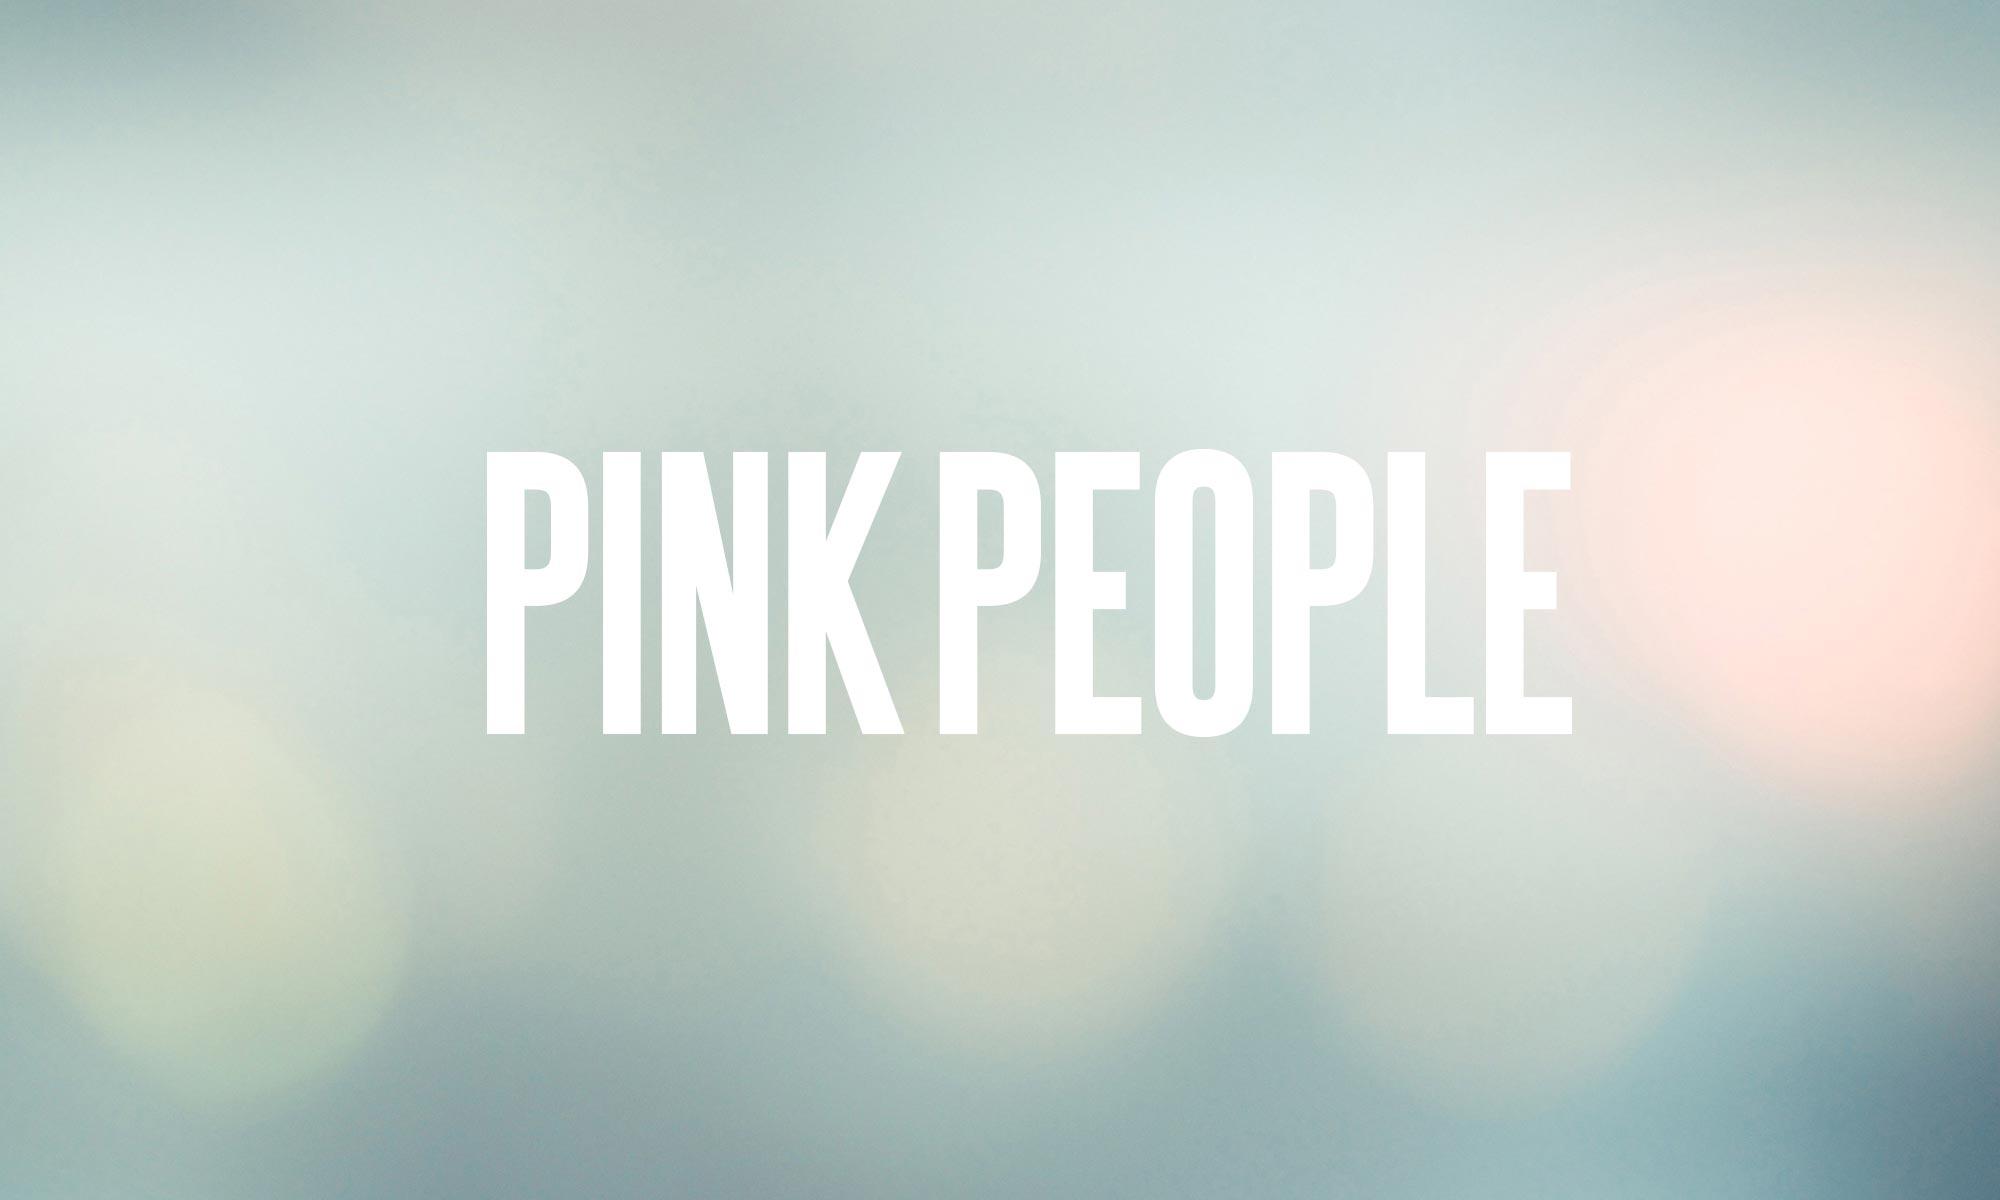 https://www.atelierzoz.com/wp-content/uploads/2020/03/works_pink-people-1.jpg